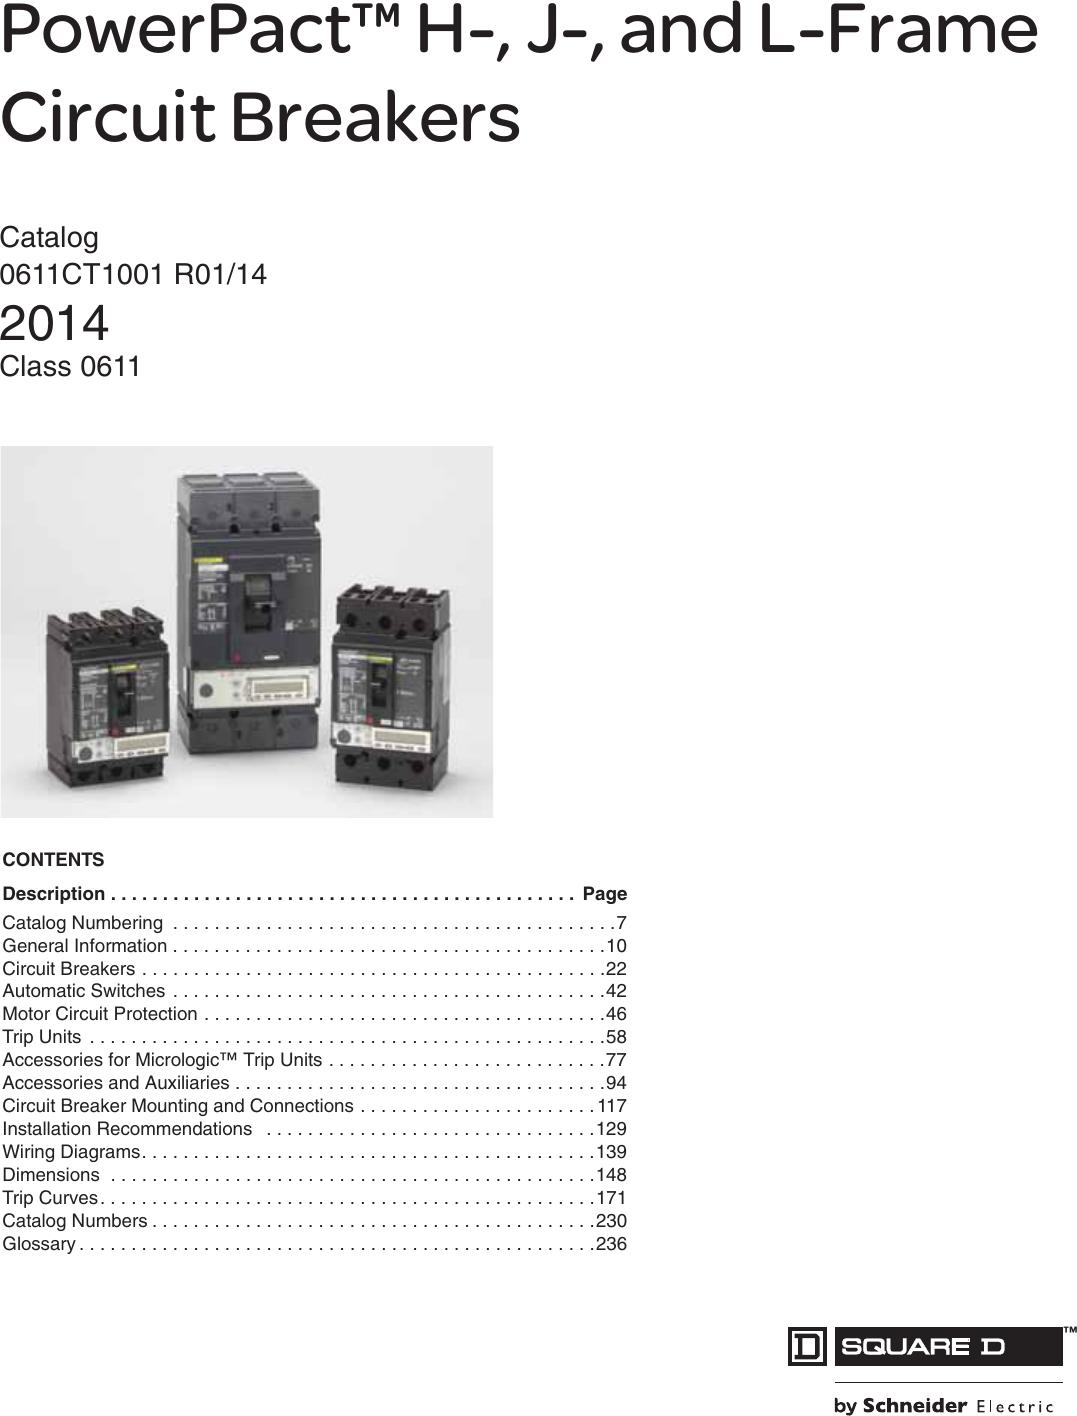 Square D HD 060 HDL 36050 PowerPact Circuit Breaker